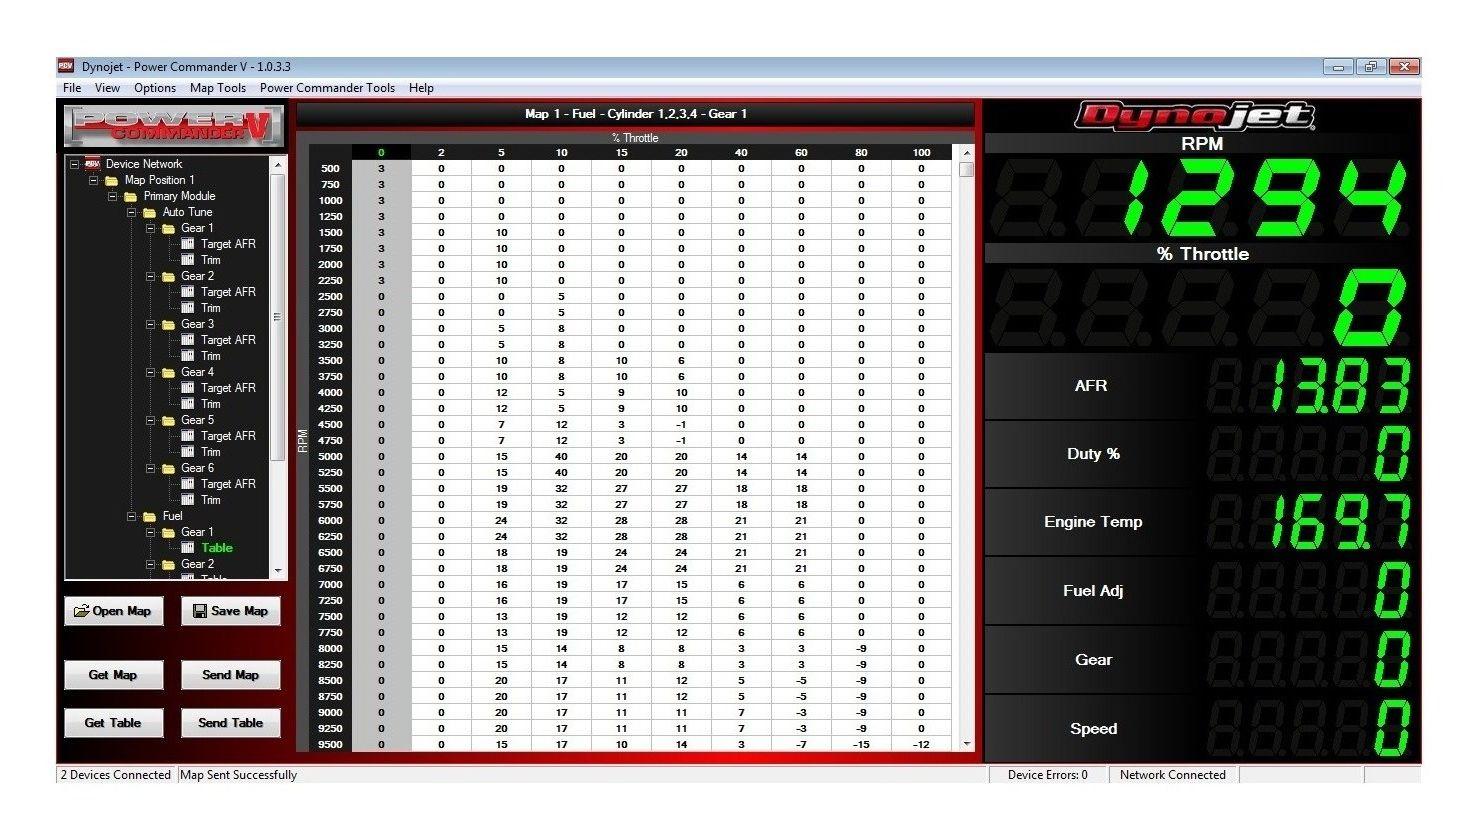 Dynojet Power Commander V Suzuki Gsxr 750 2006 2010 15 6000 06 Wire Harness Color Code Off Revzilla